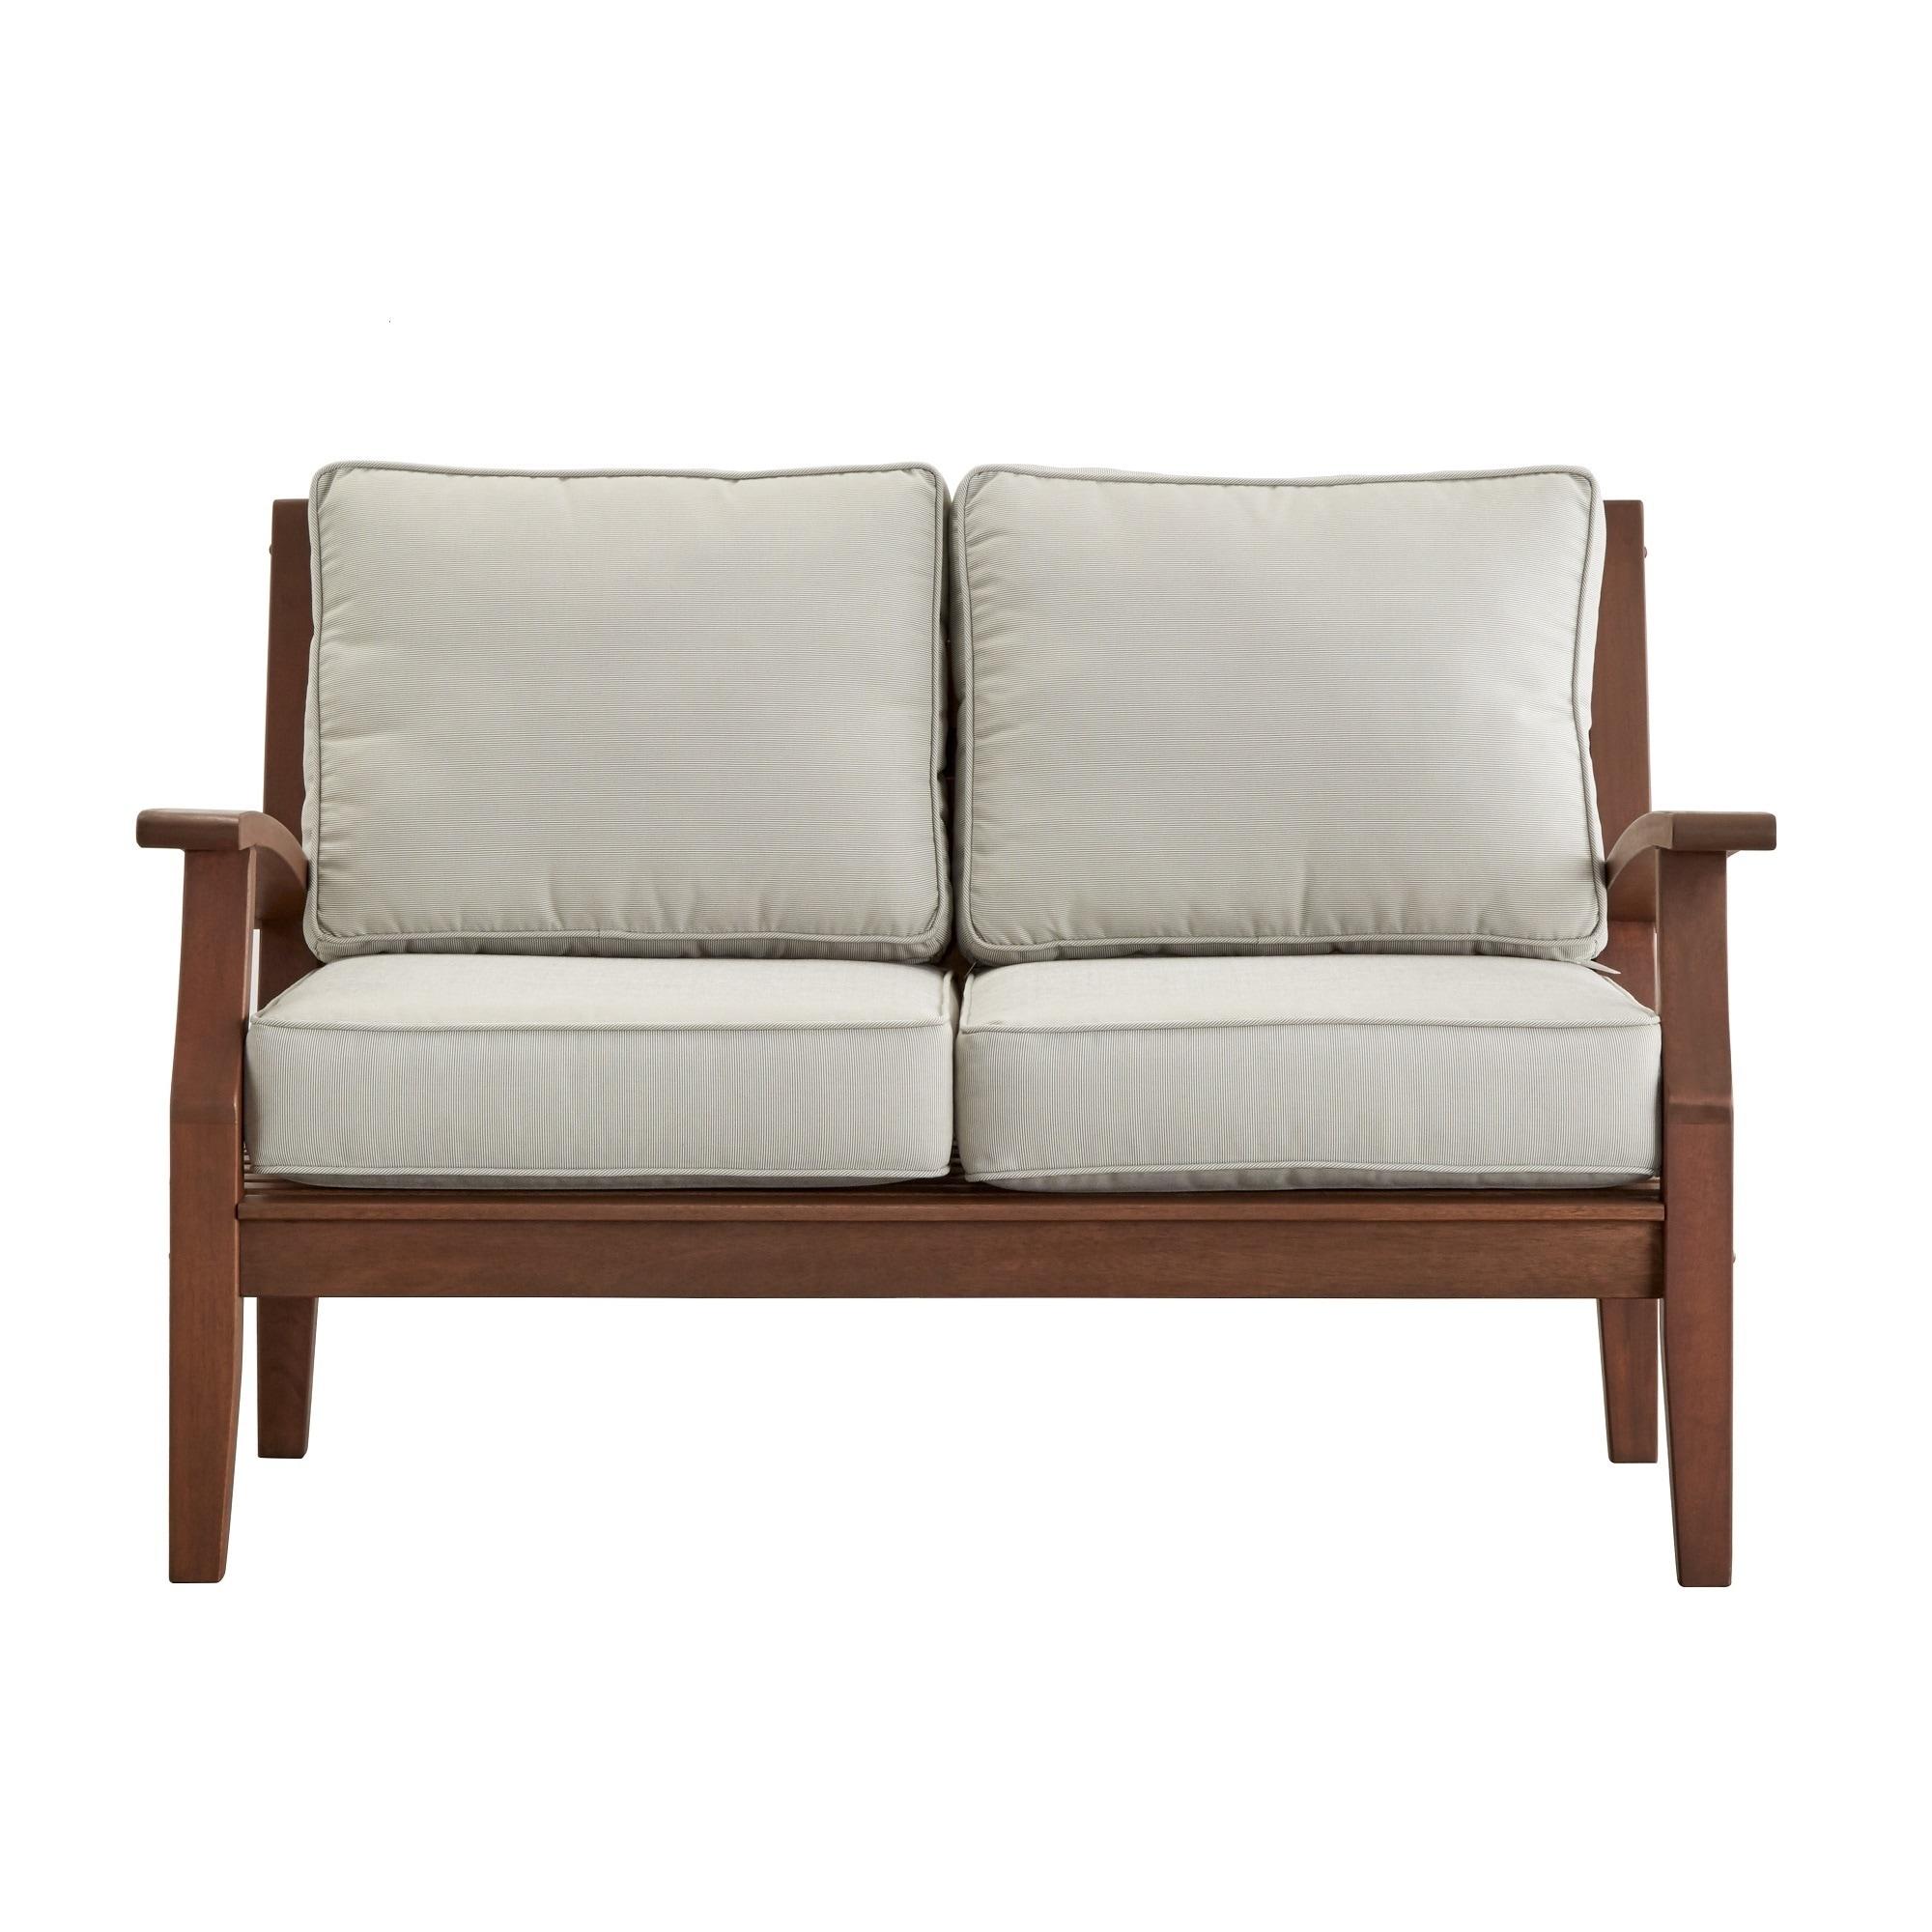 microfiber trim hm ebay room couch sofa living ims wood set celio furniture brown itm loveseat